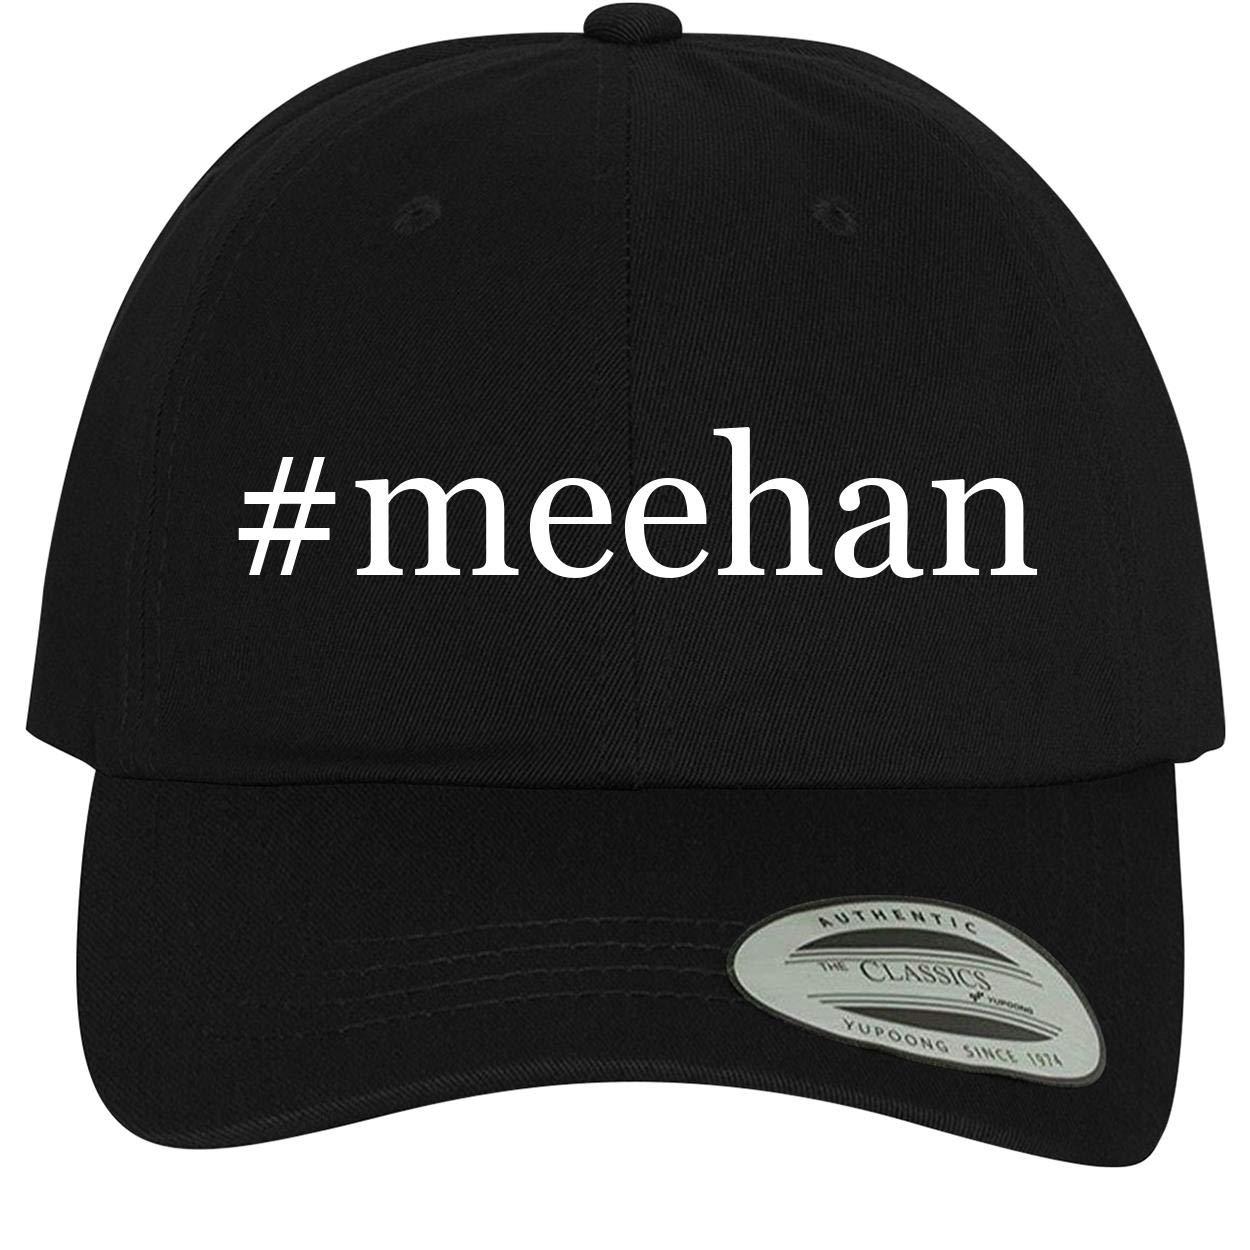 BH Cool Designs #Meehan Comfortable Dad Hat Baseball Cap